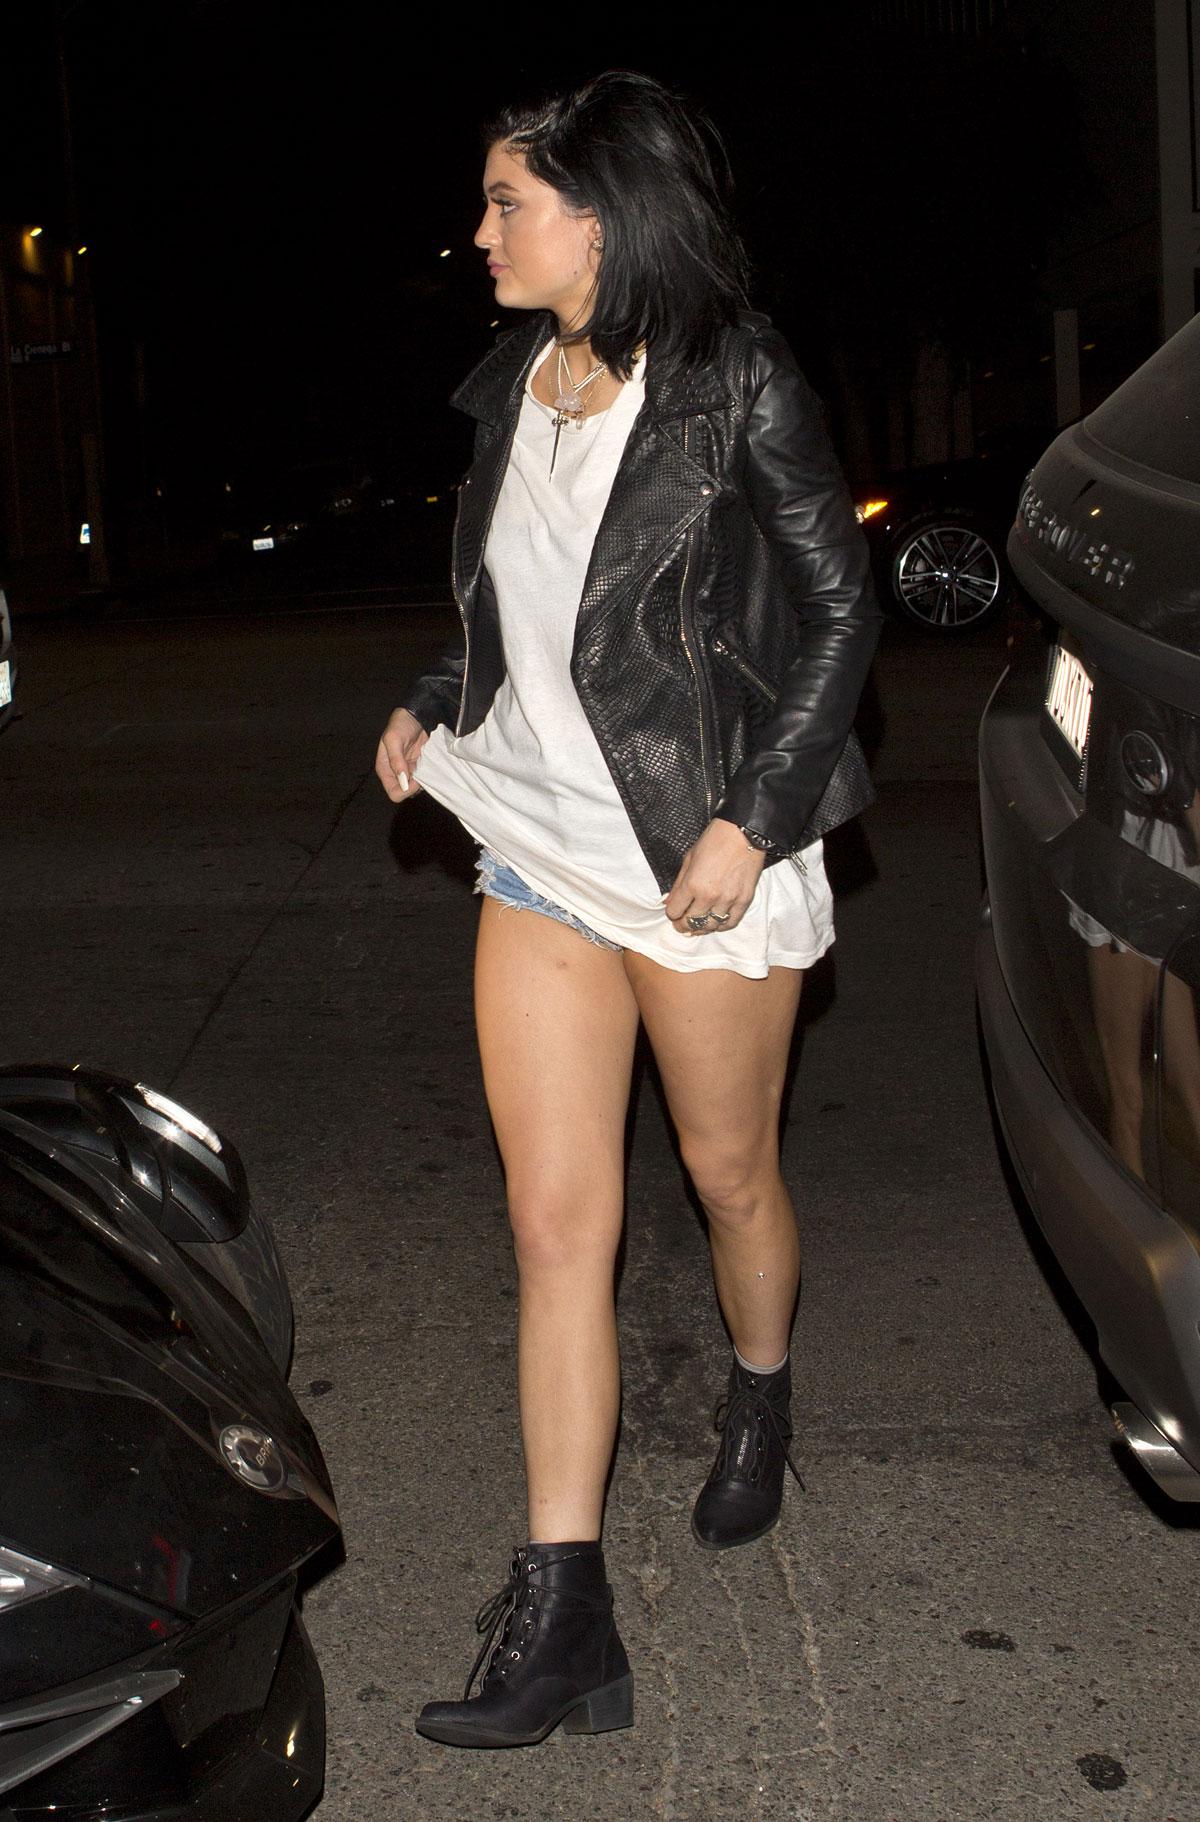 Kendall & Kylie Jenner at STK restaurant